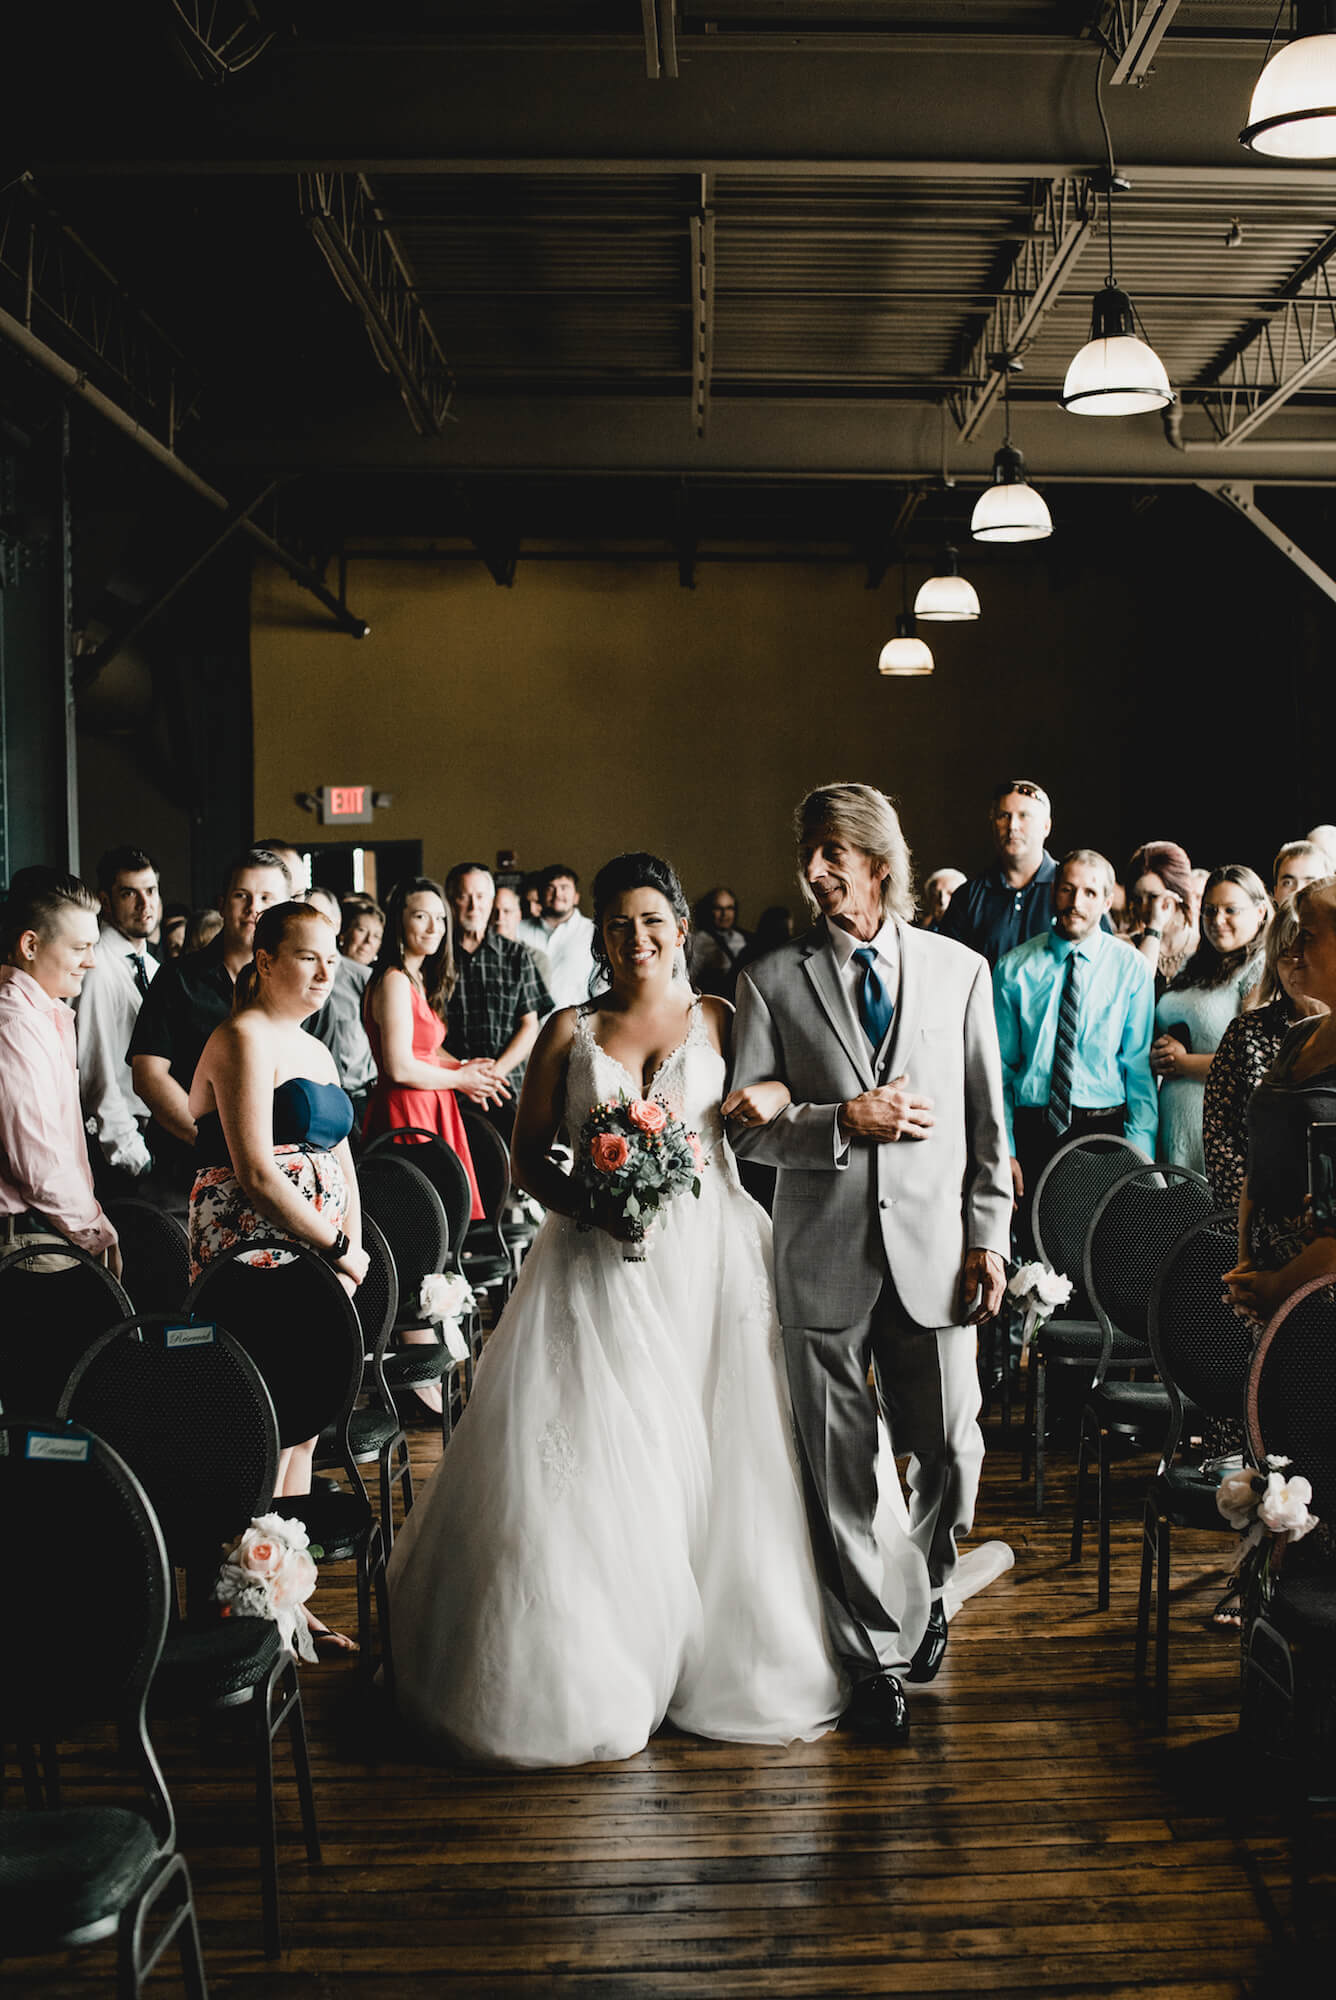 engle-olson-jen-chad-minnesota-wedding- (312 of 1332).jpg